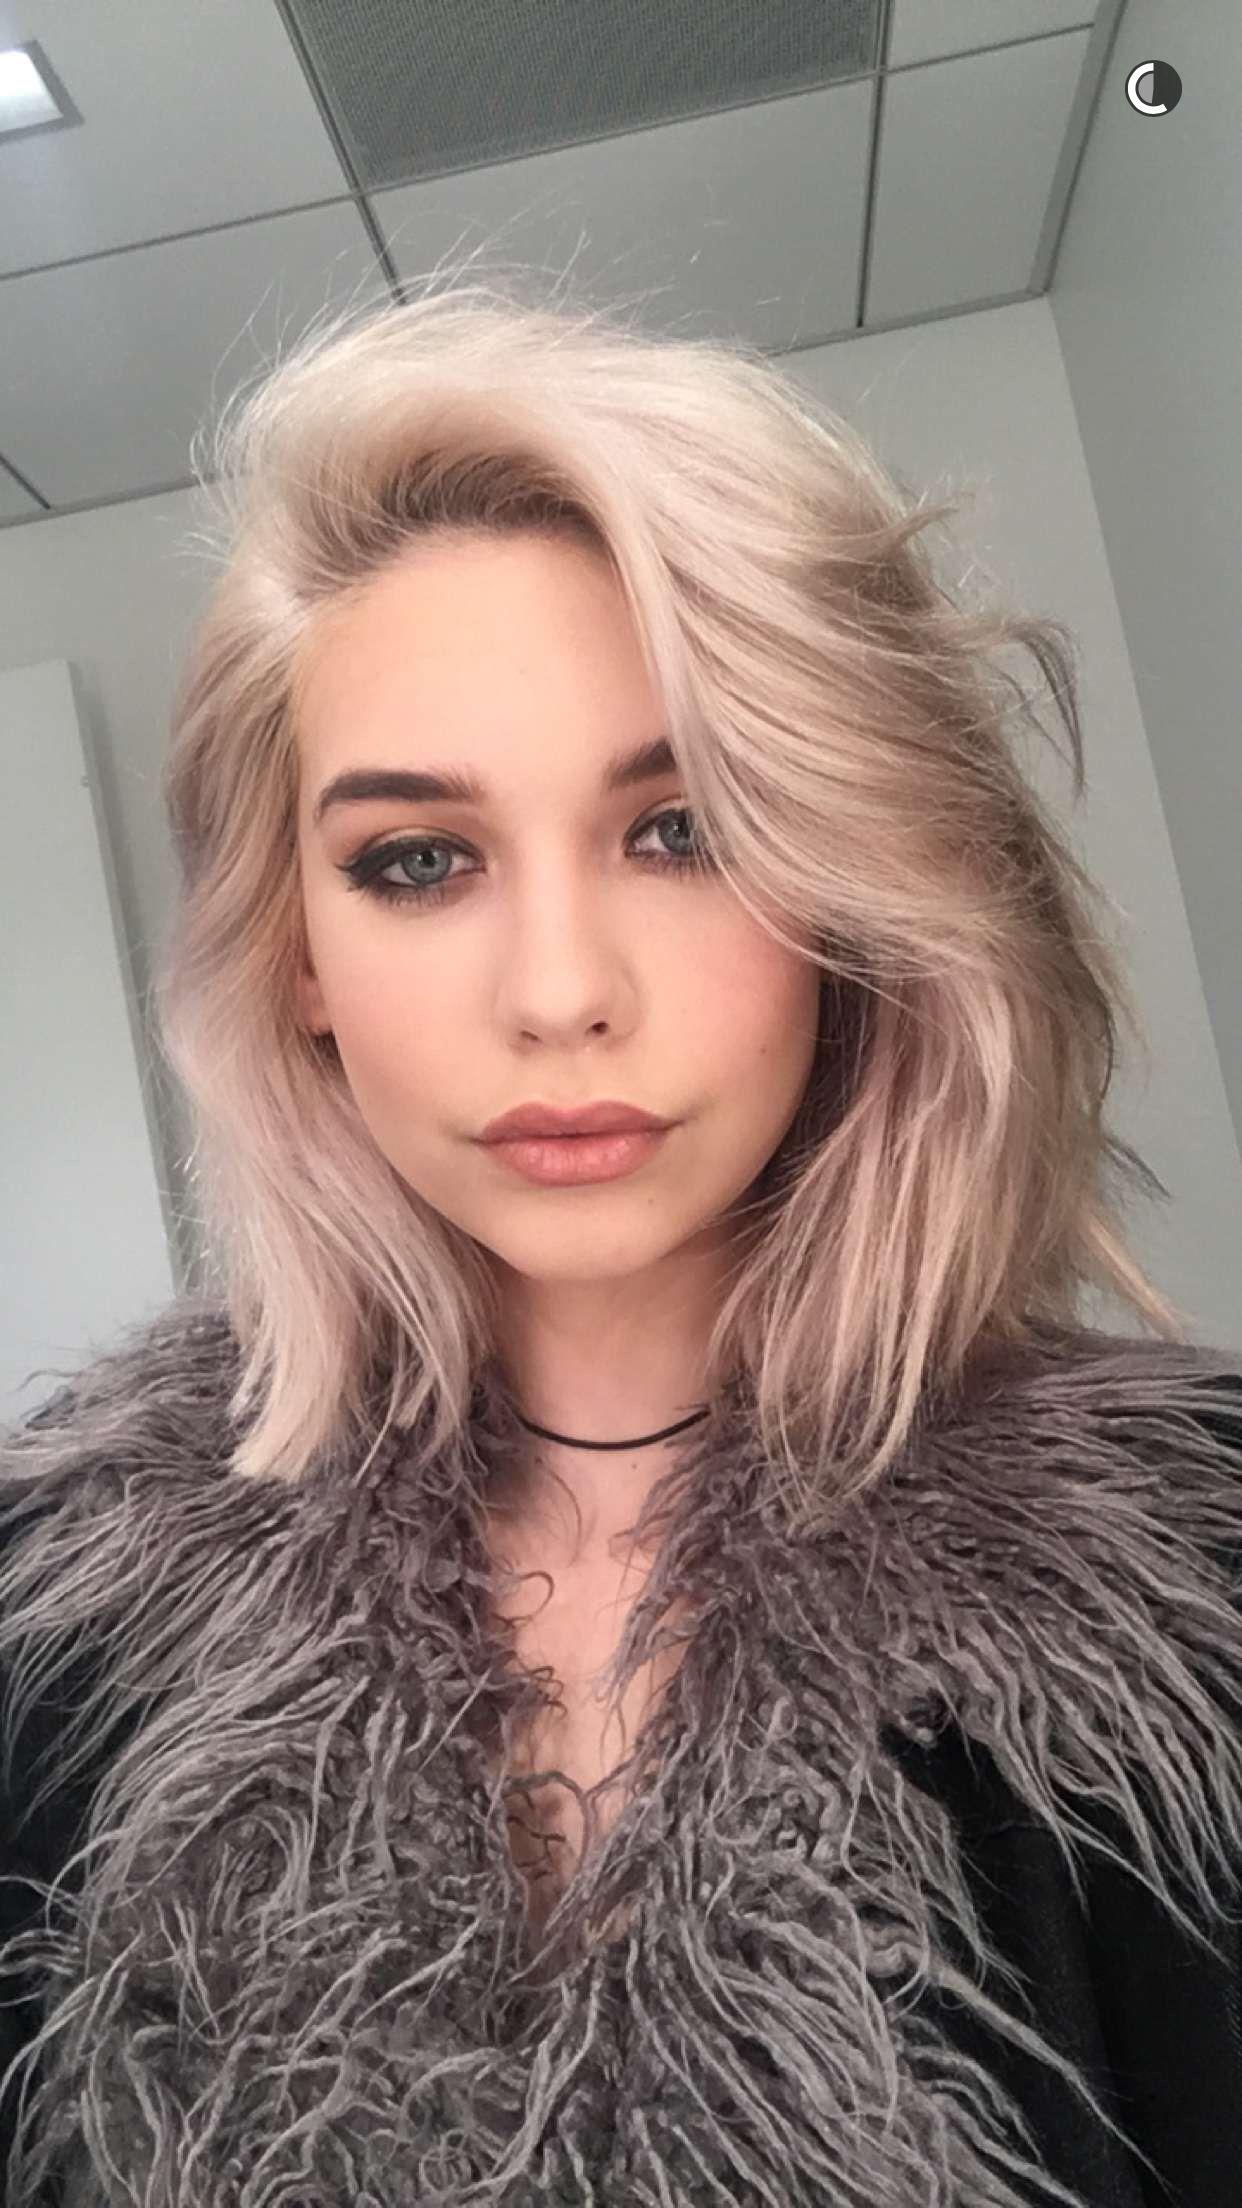 Make Up By Mandy 24